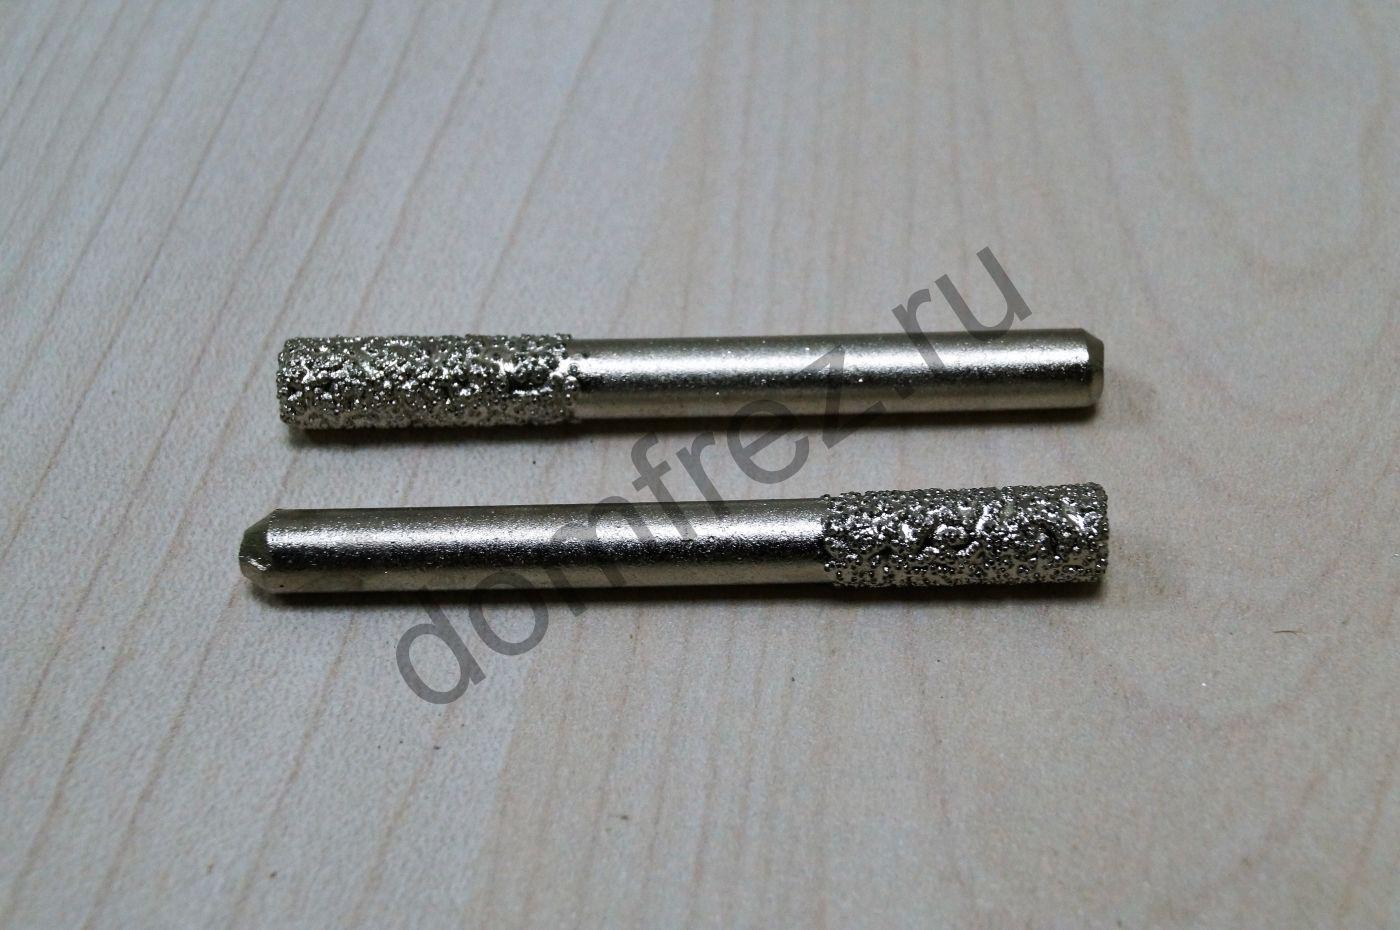 Фреза алмазная концевая фасонная №3 6x20x60 A8910603